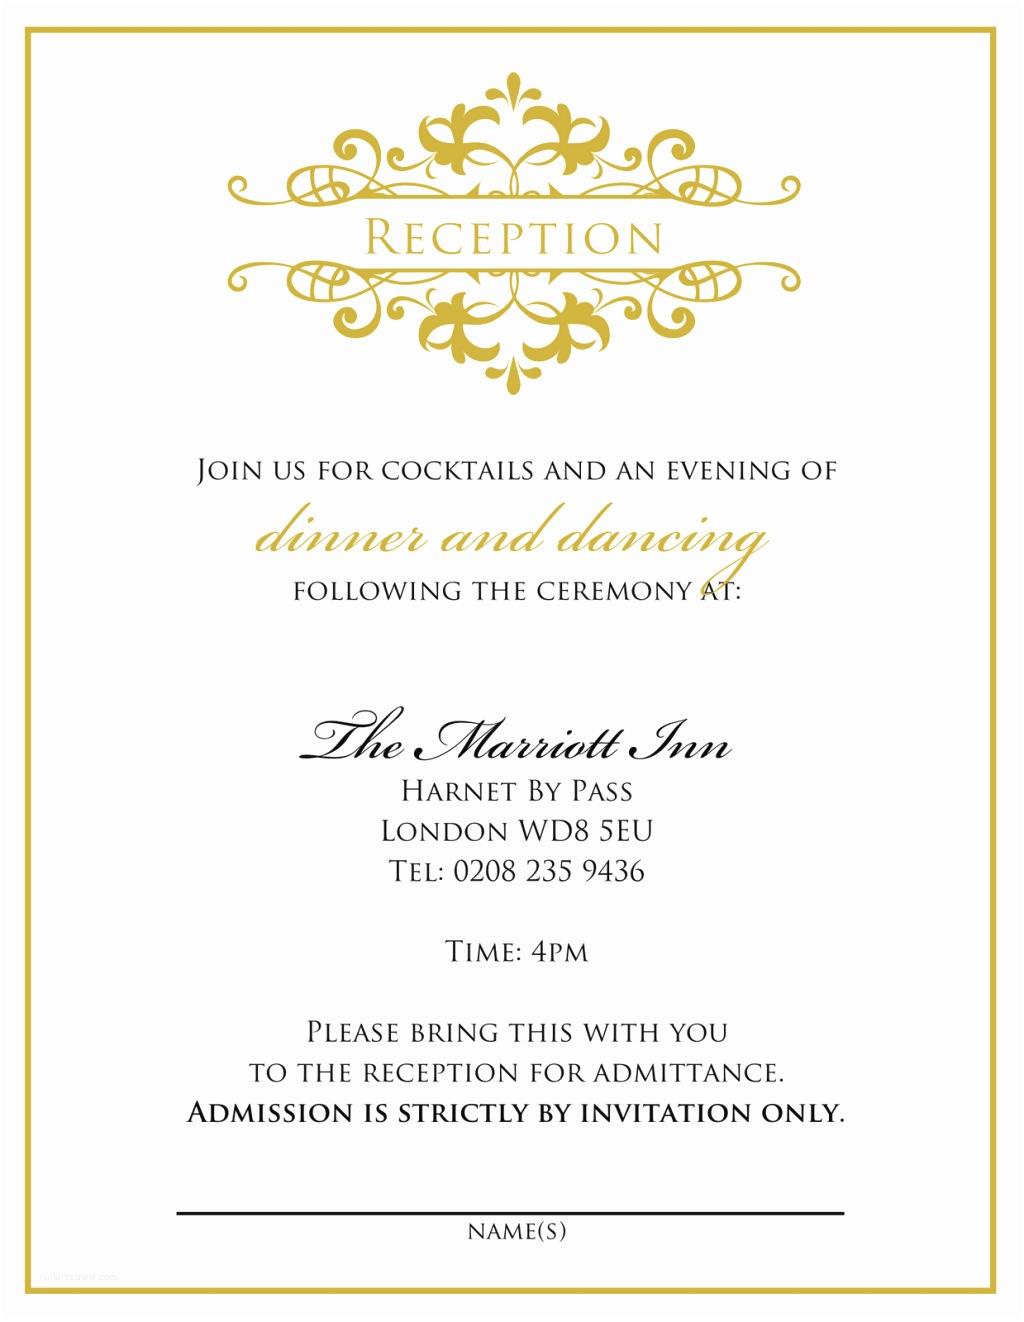 Wedding Reception Invitation Wording Wedding Invitation Wording From Bride and Groom